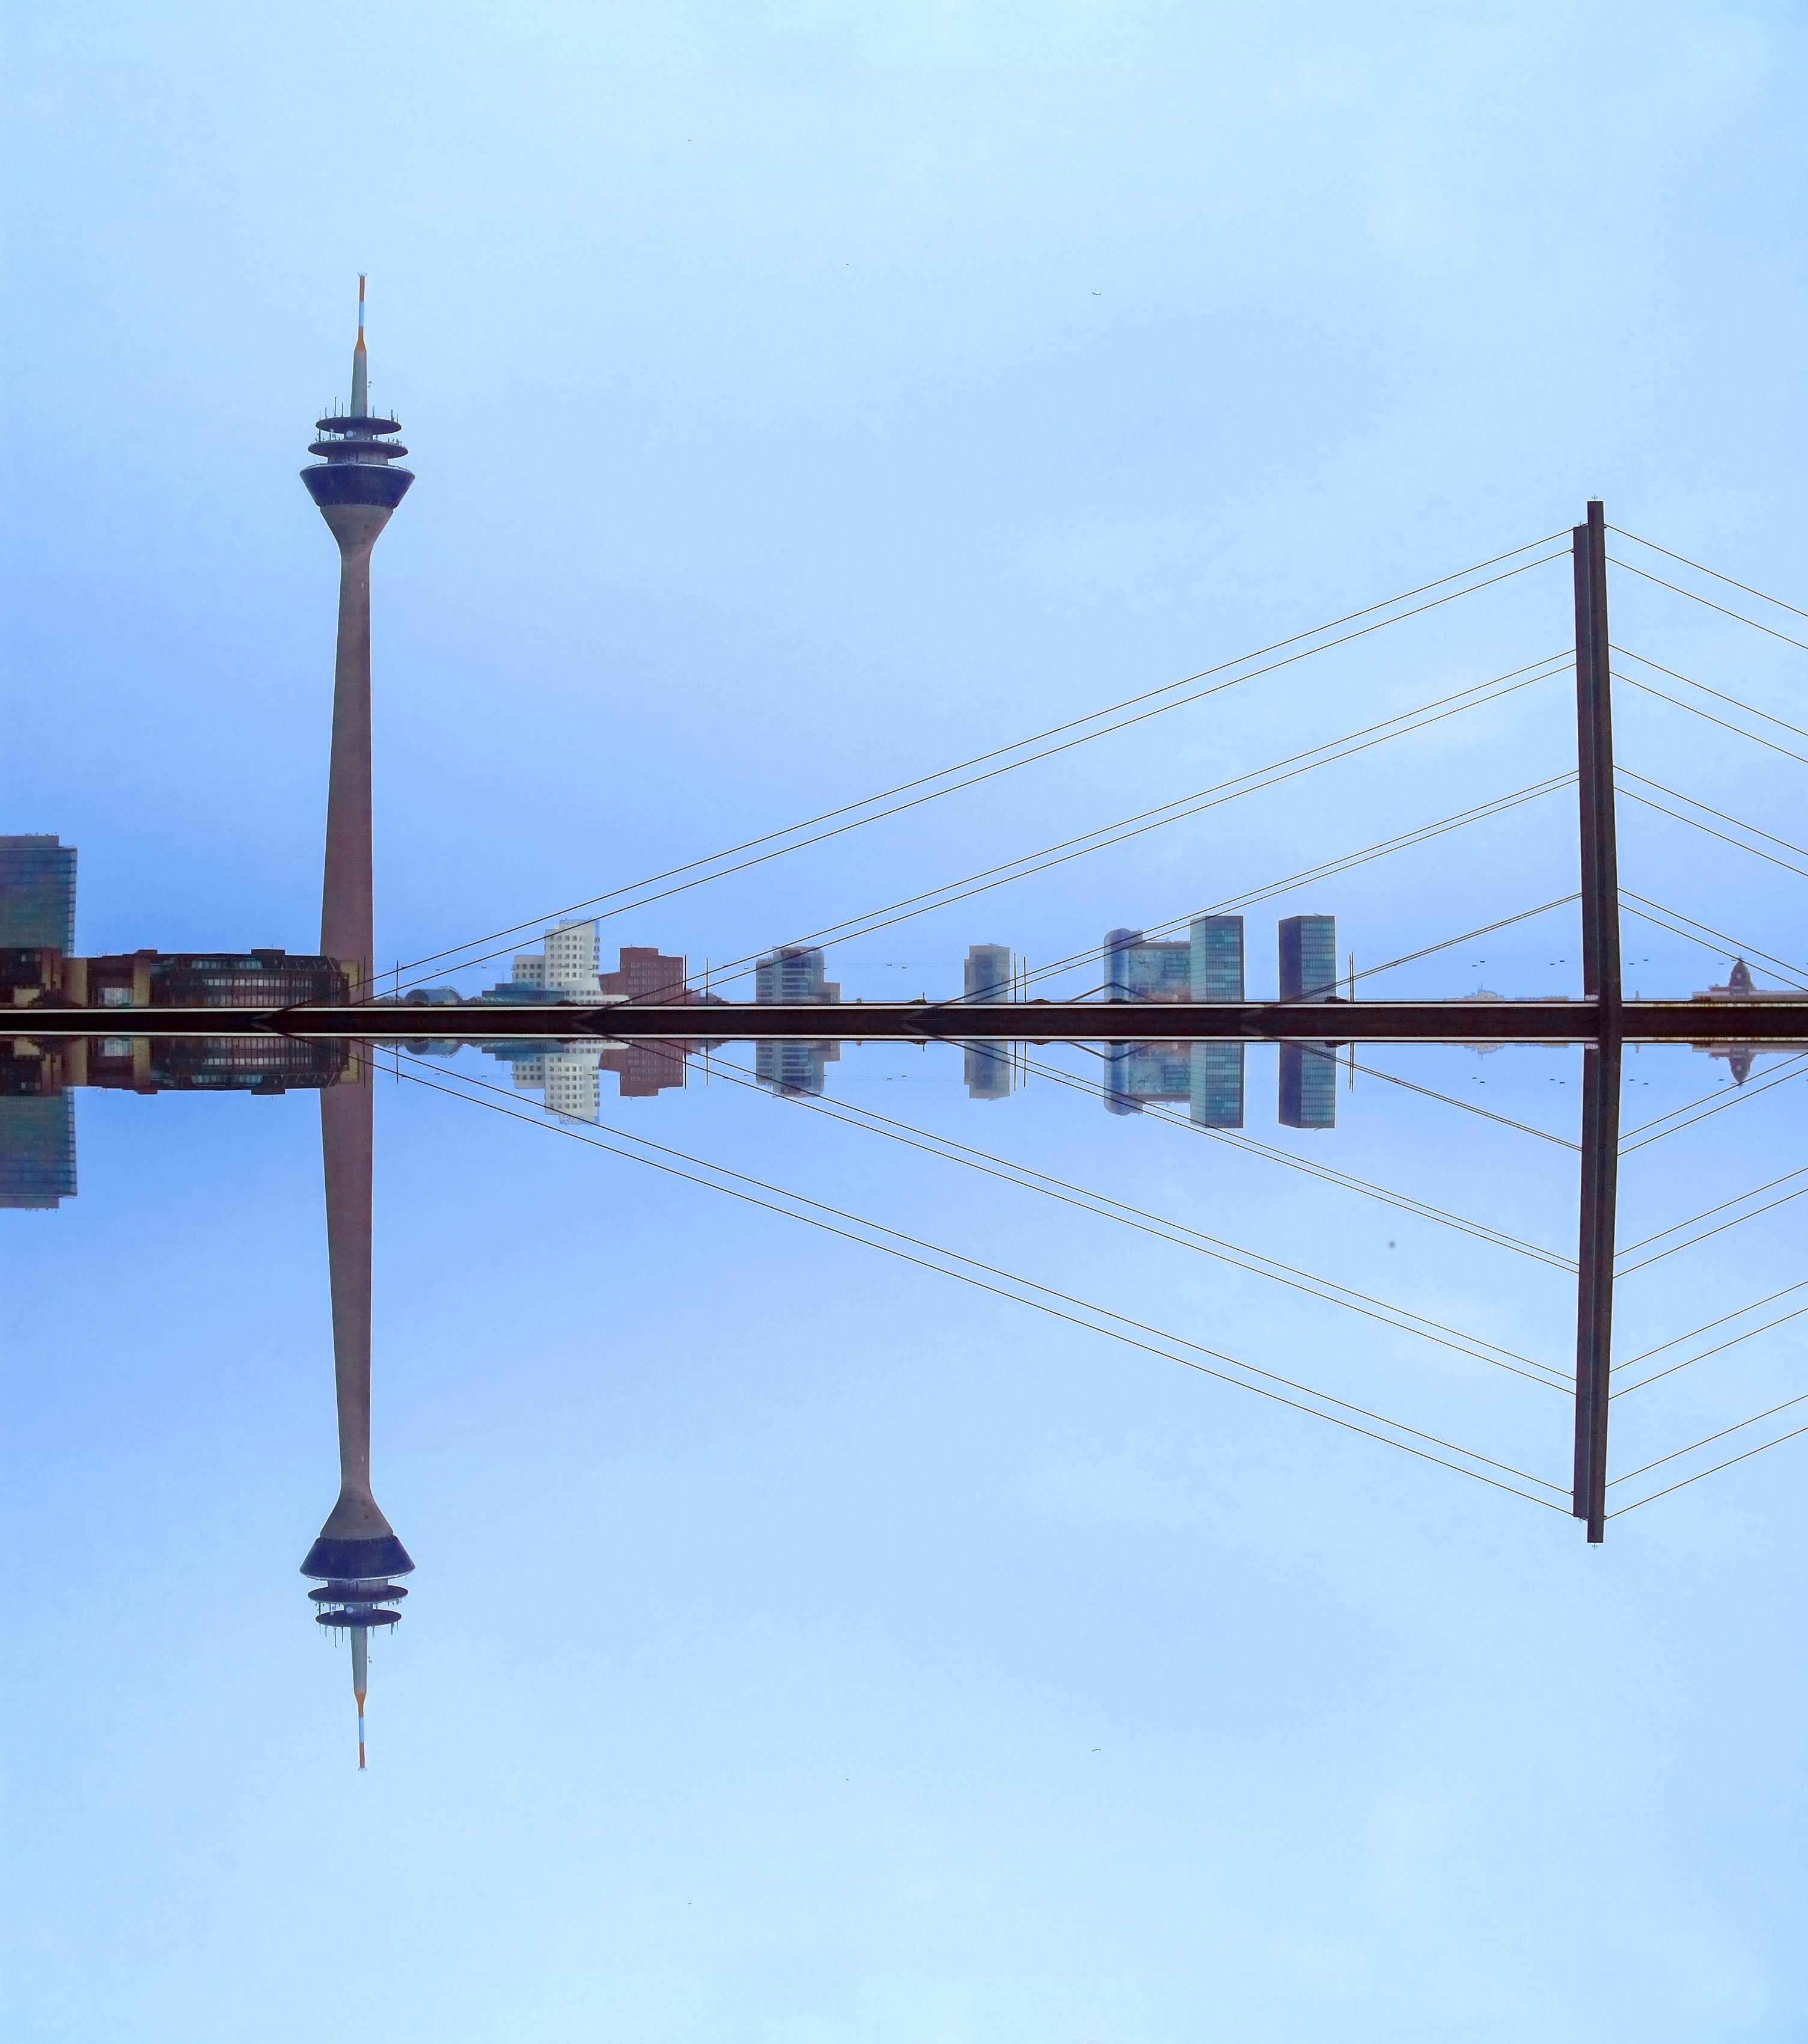 Онлайн-экскурсия: «Архитектурный зоопарк Дюссельдорфа»